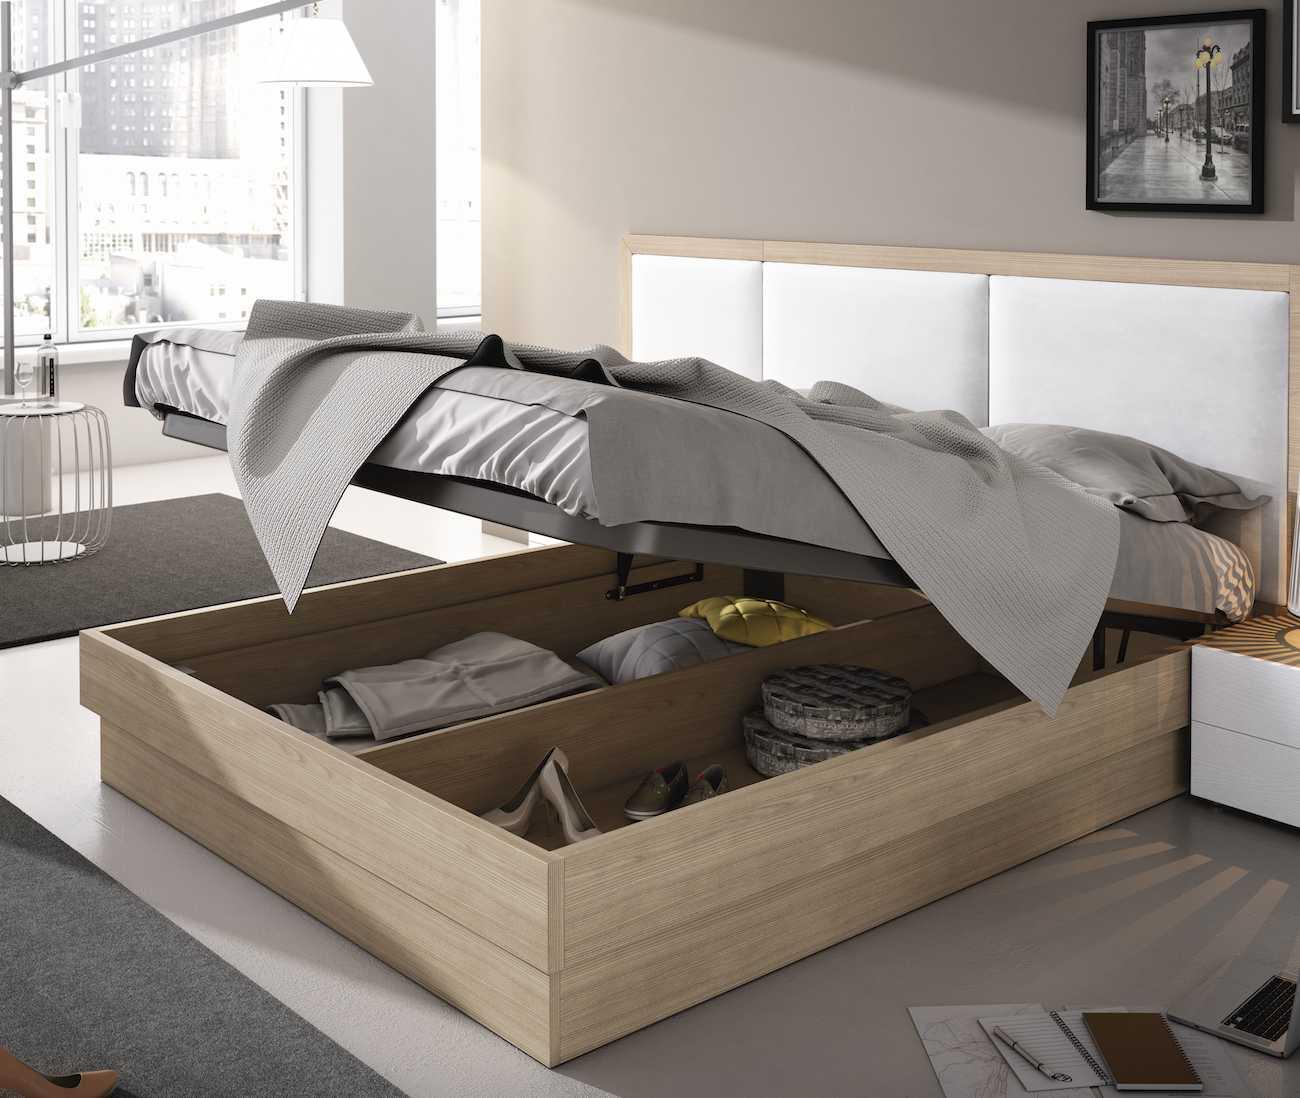 Consejos para compra canap s cama colchonexpr s for Que es un canape